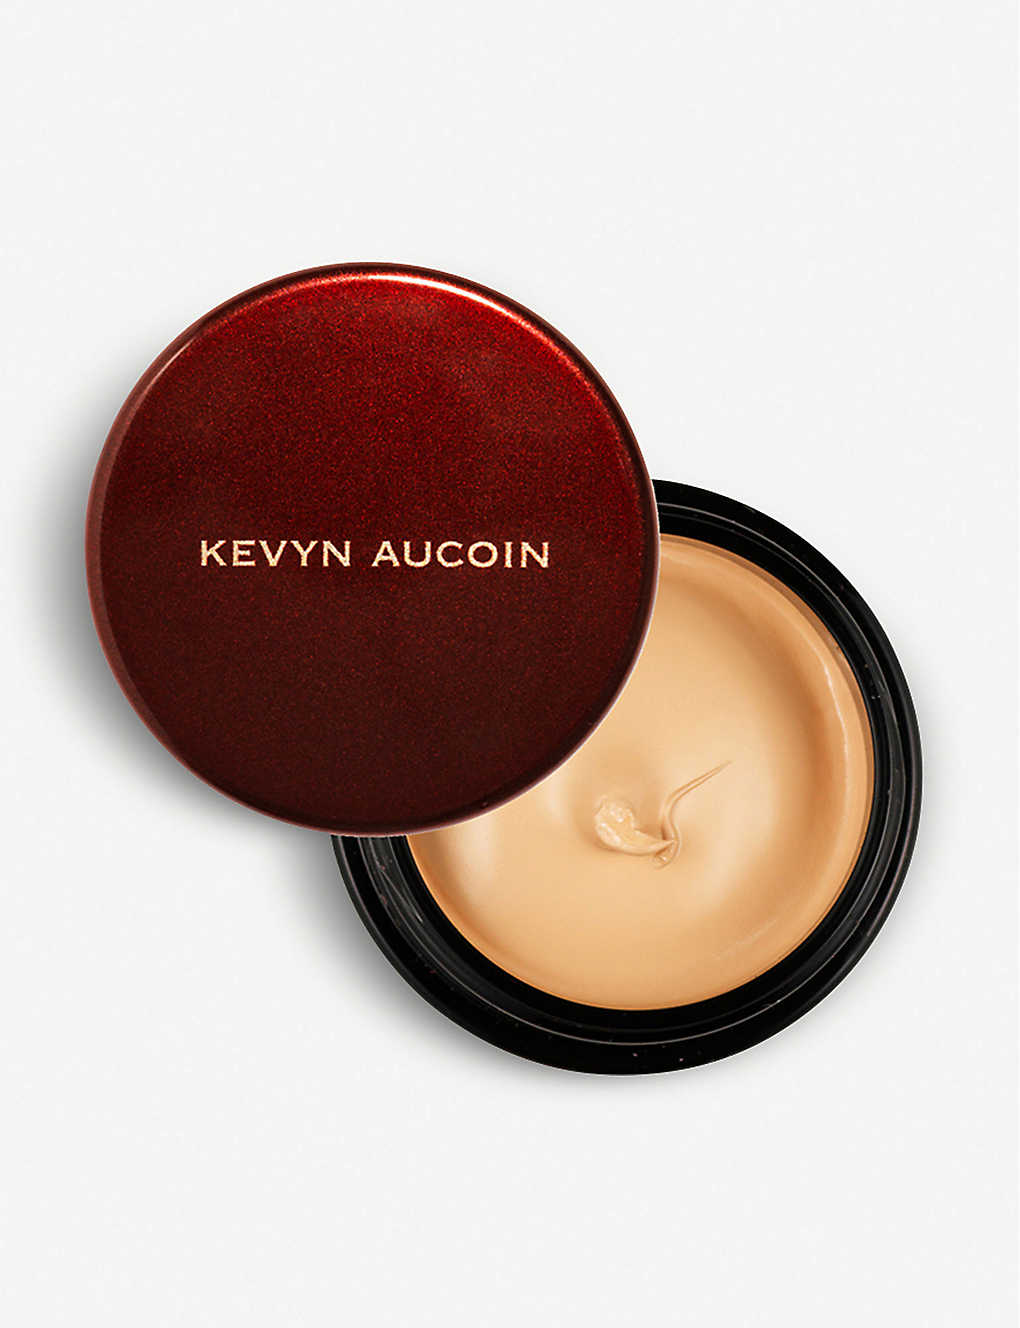 KEVYN AUCOIN: The Sensual Skin Enhancer Concealer 18g